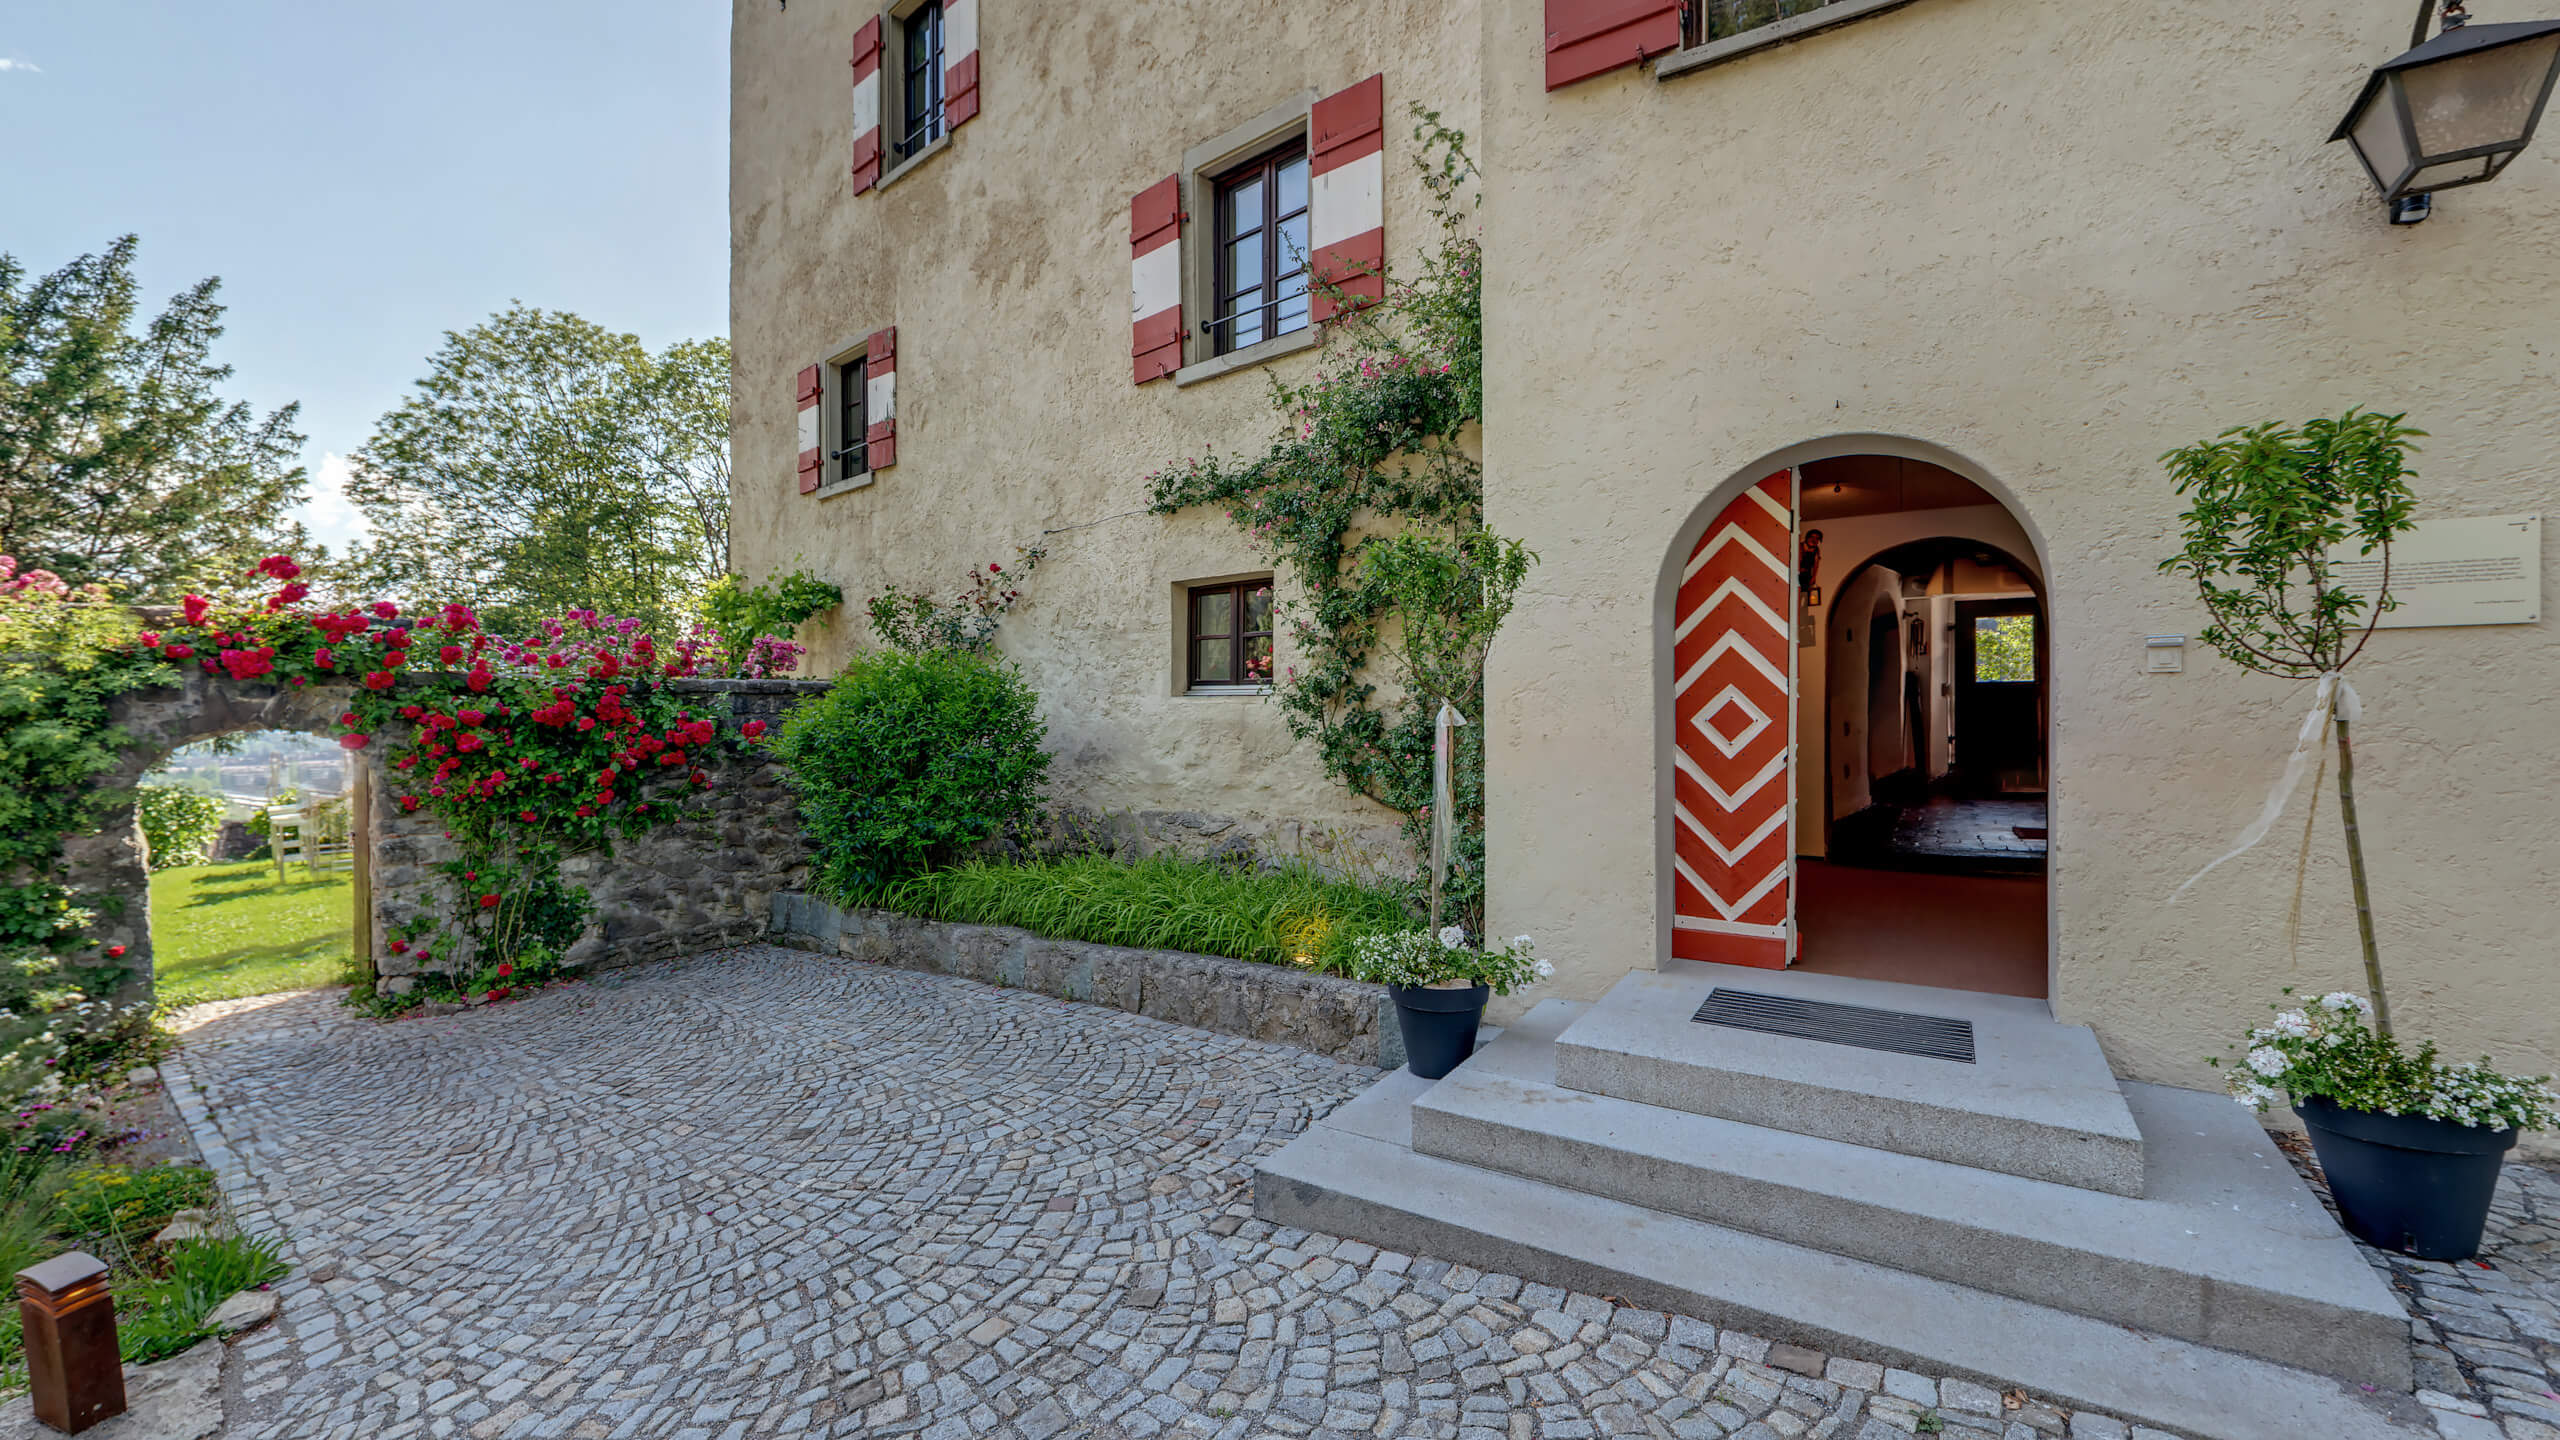 Historie des Schloss Amberg